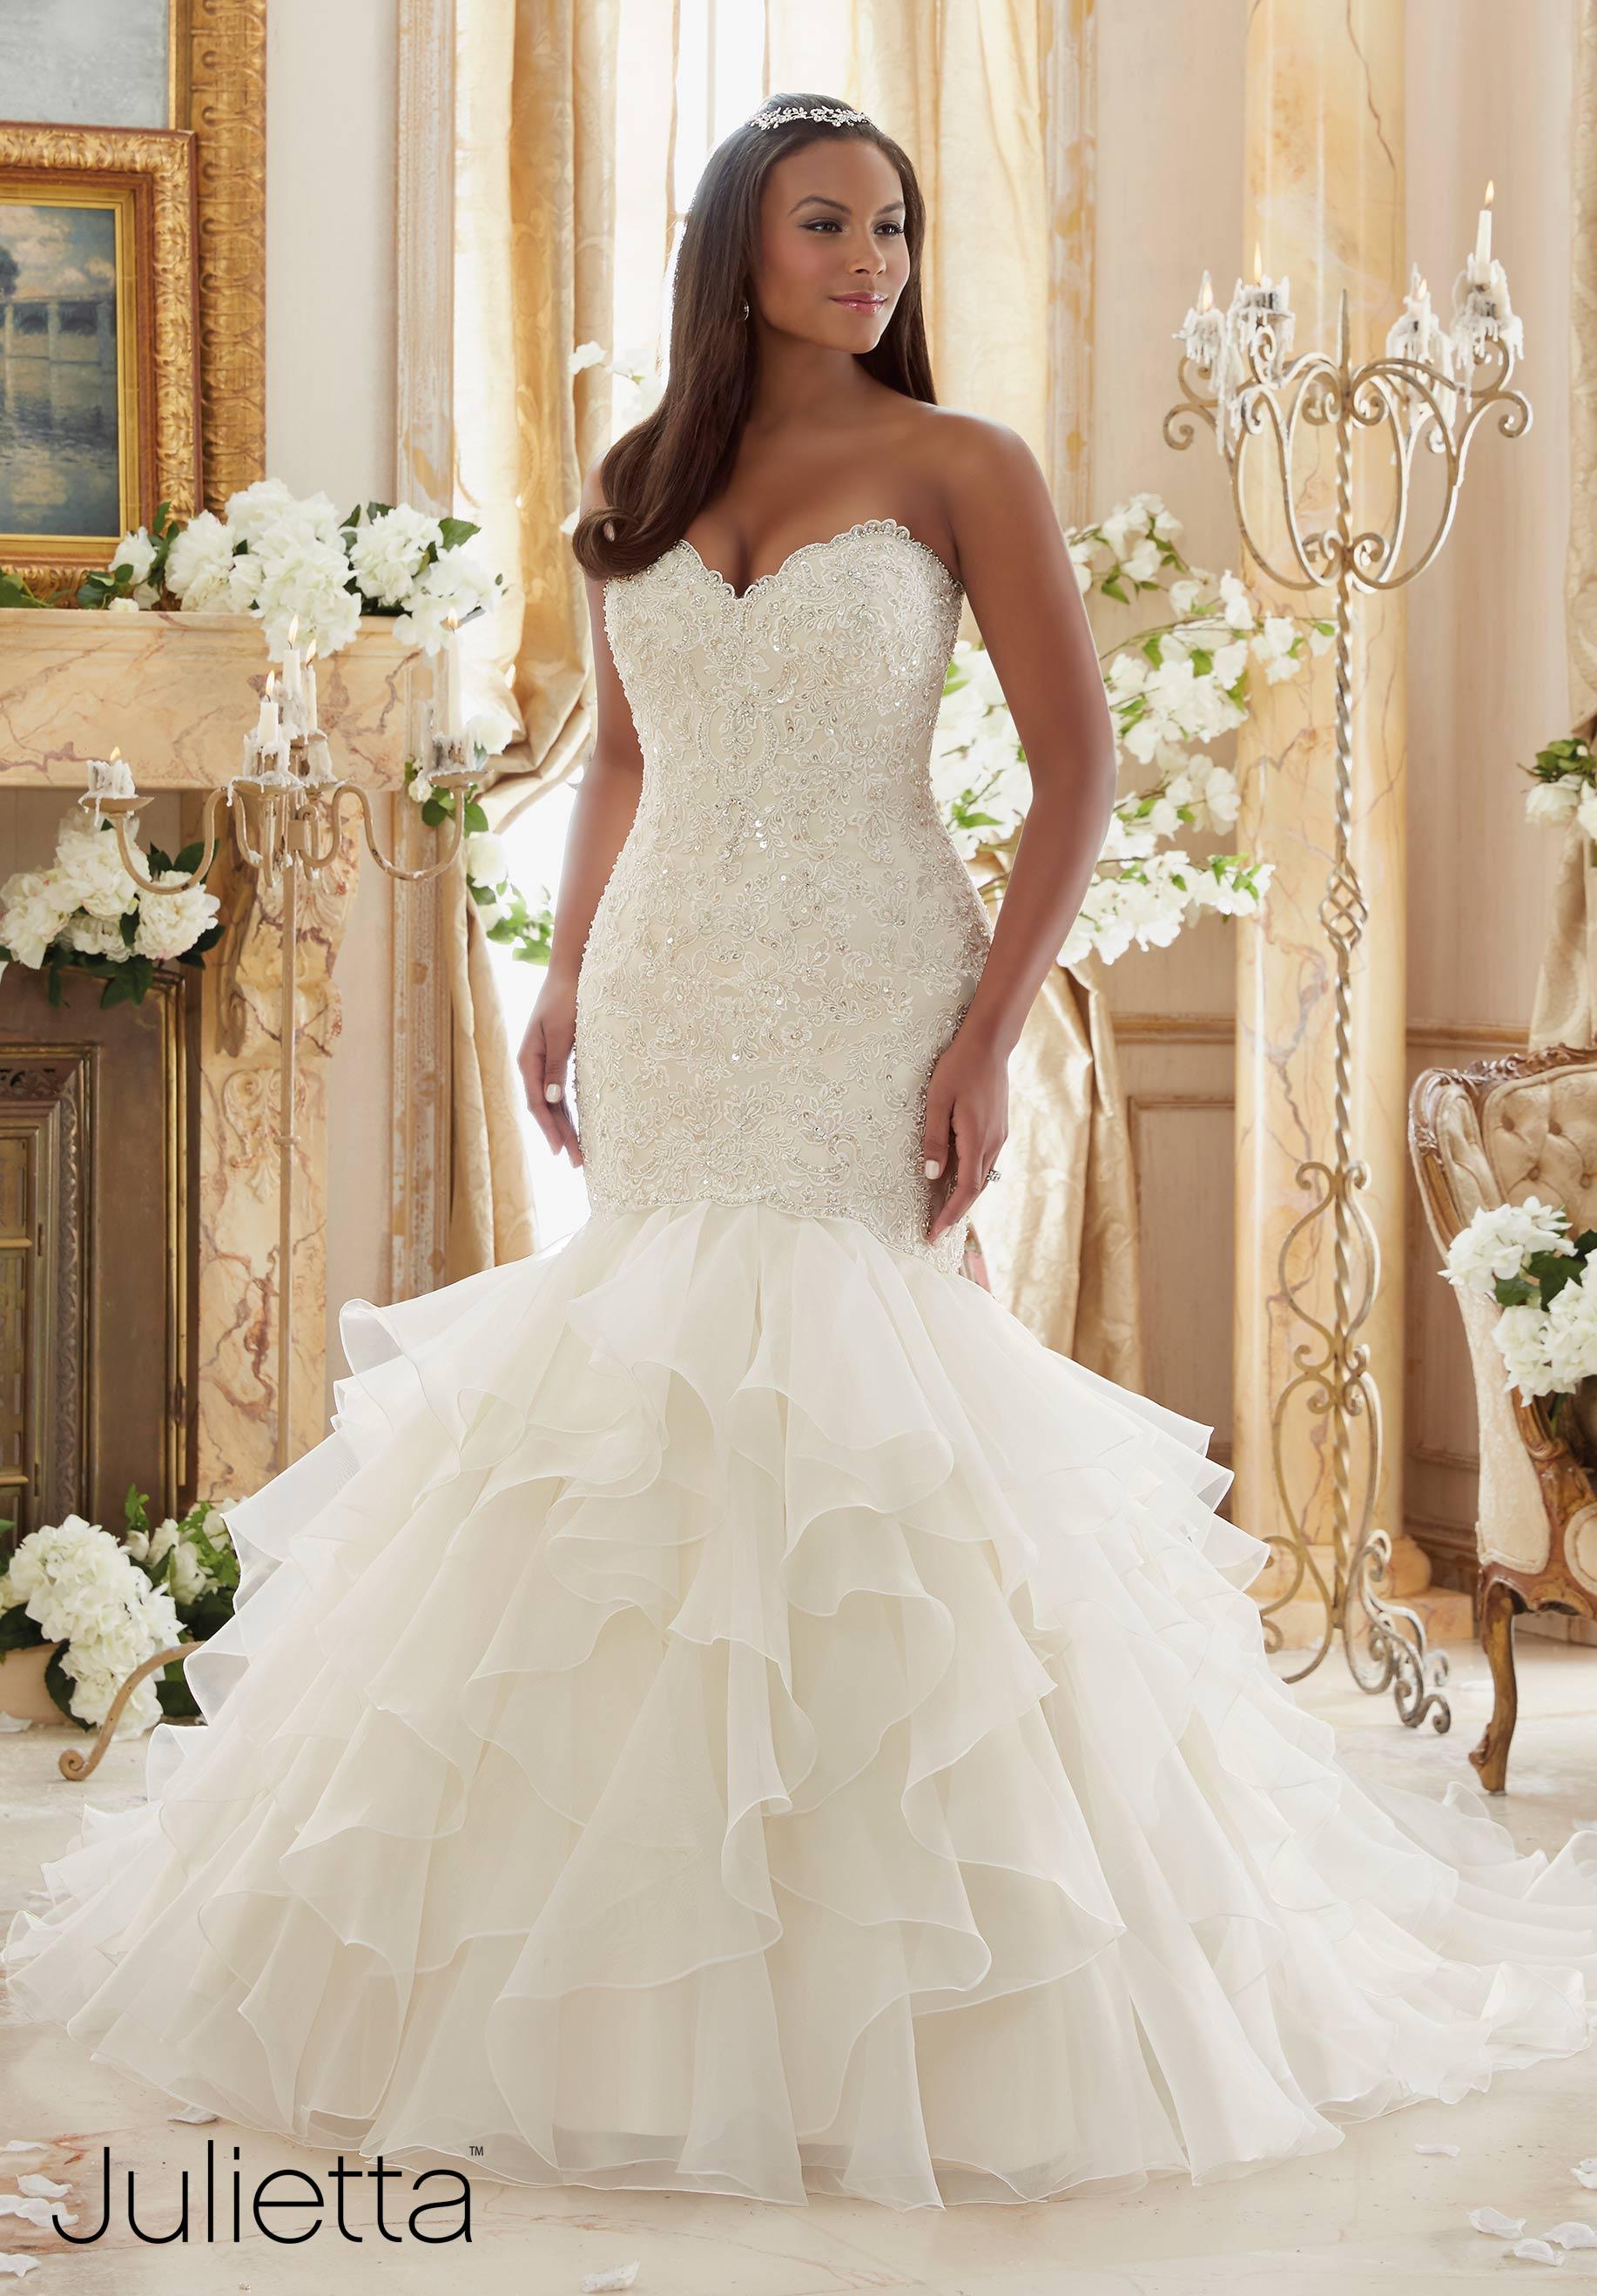 8453324 - Bridal Boutique Maryland